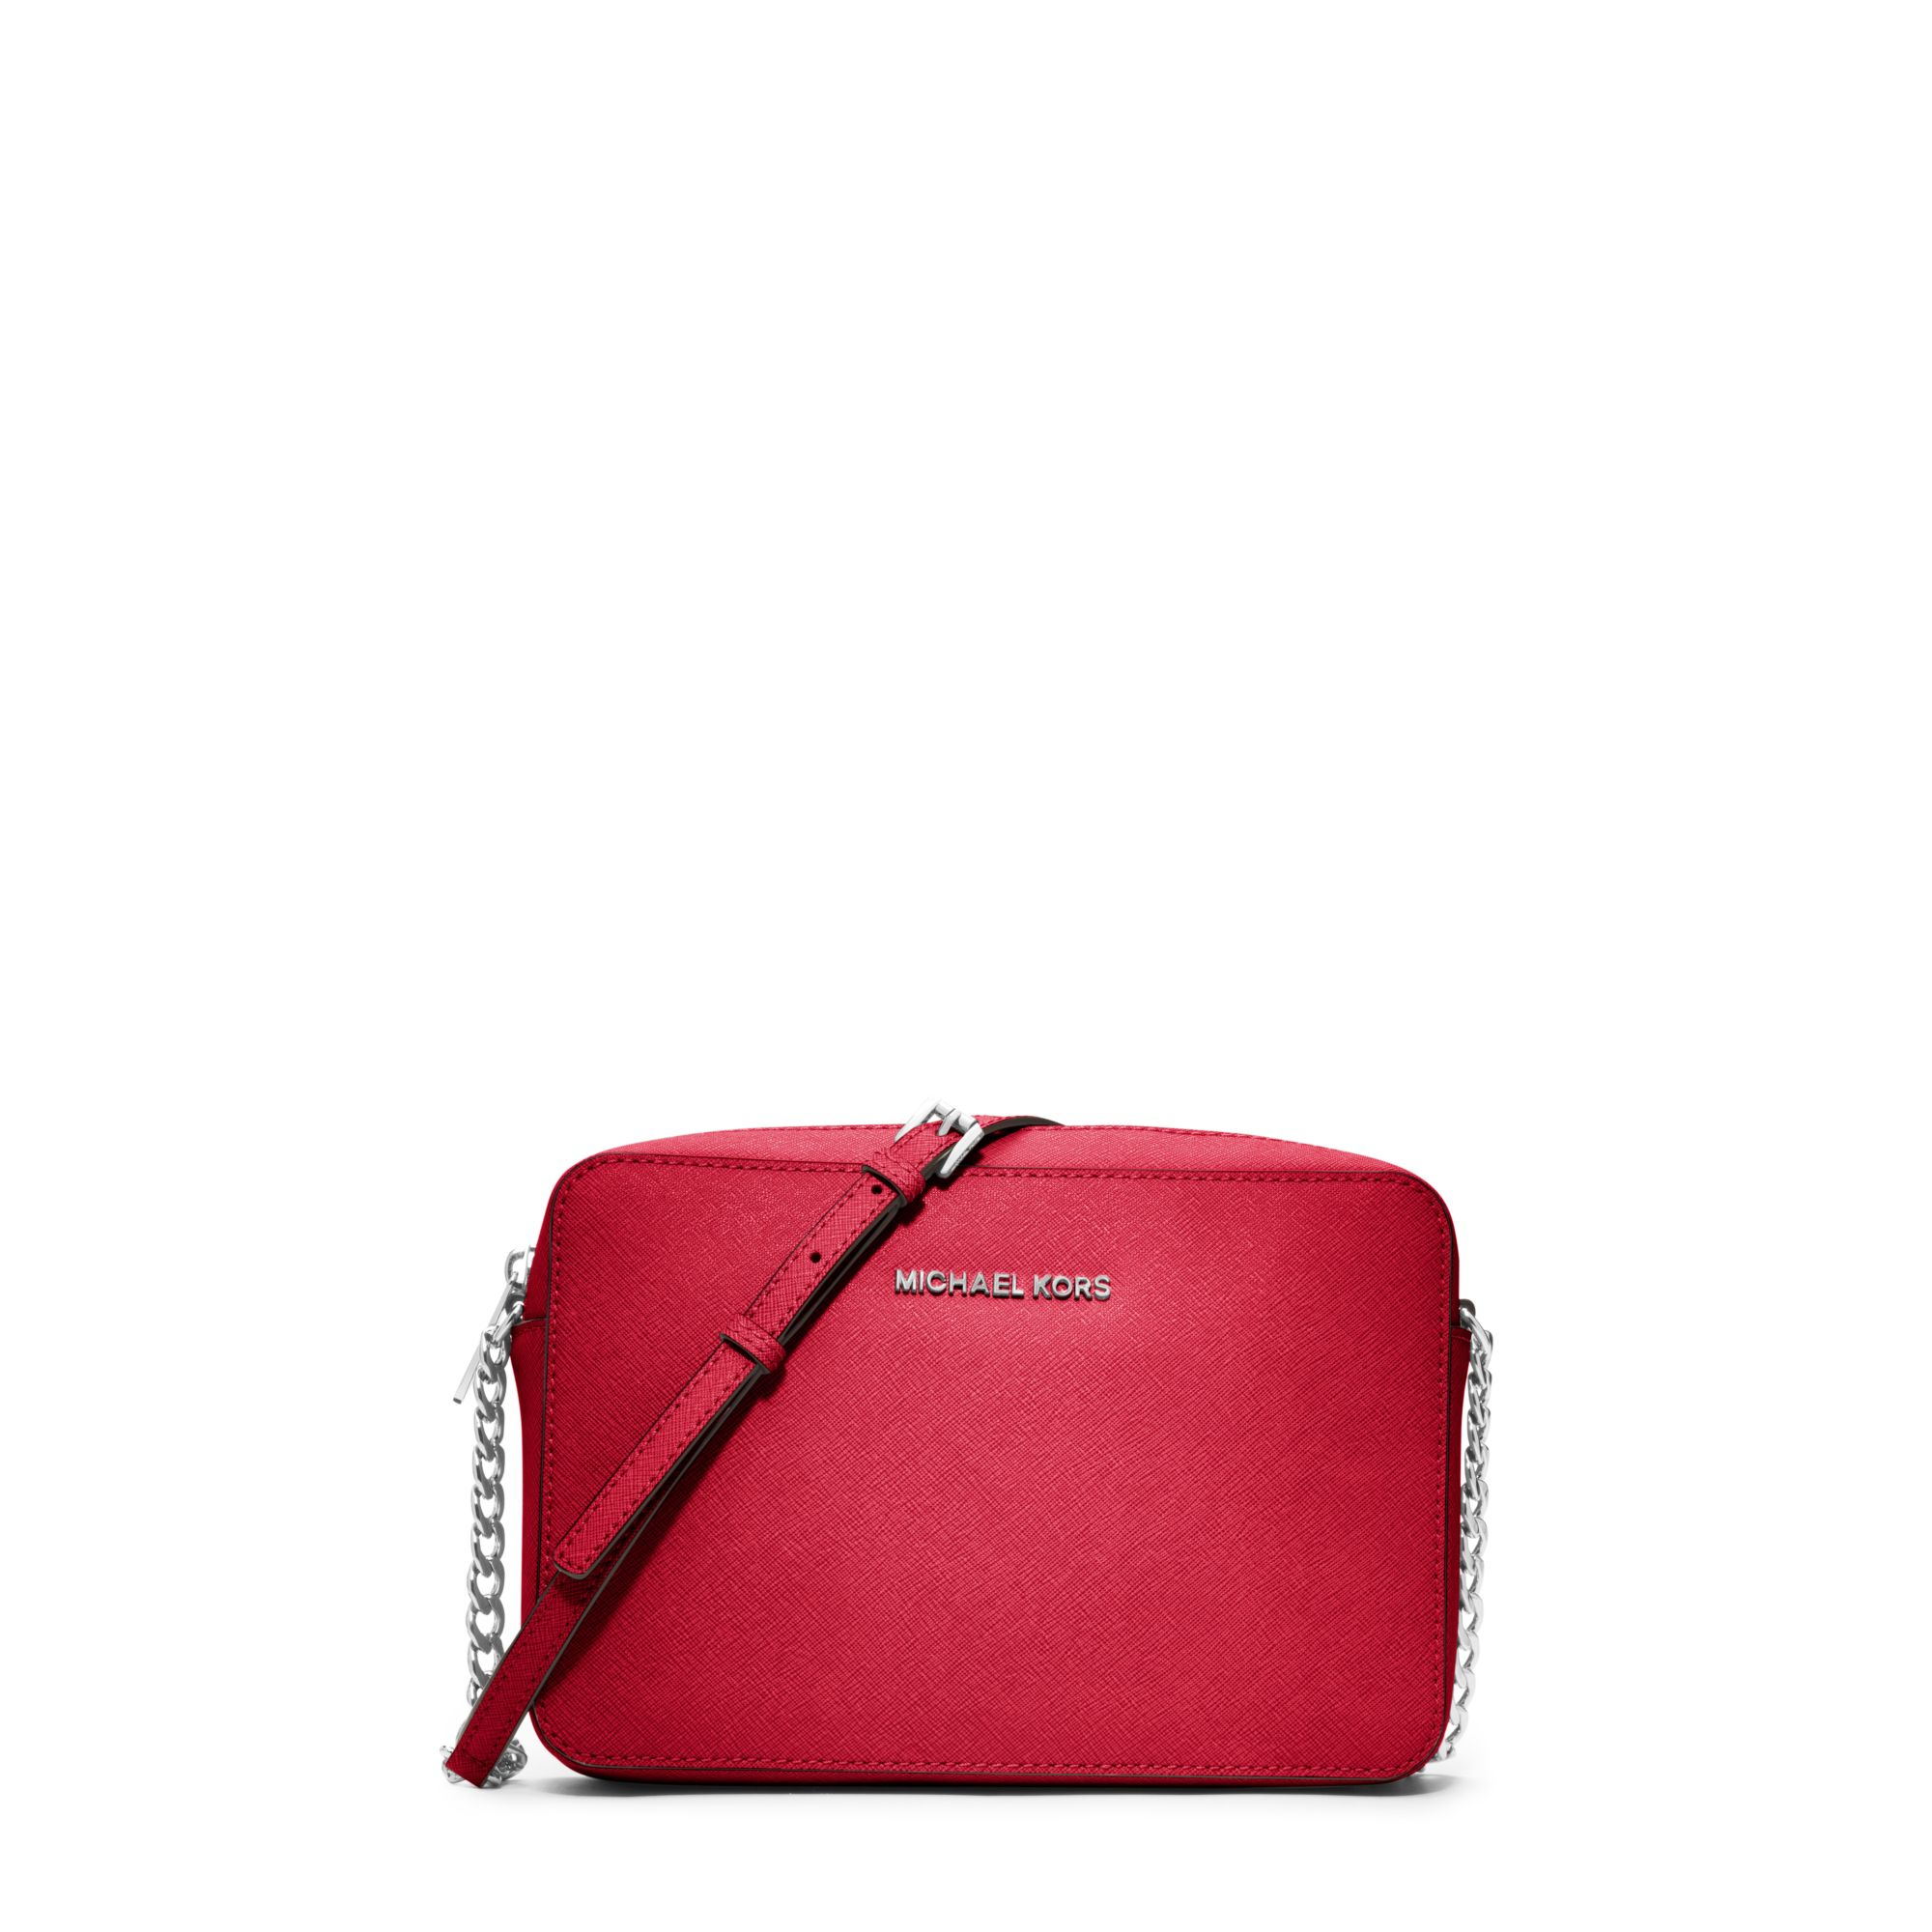 michael kors jet set travel large saffiano leather crossbody in red. Black Bedroom Furniture Sets. Home Design Ideas